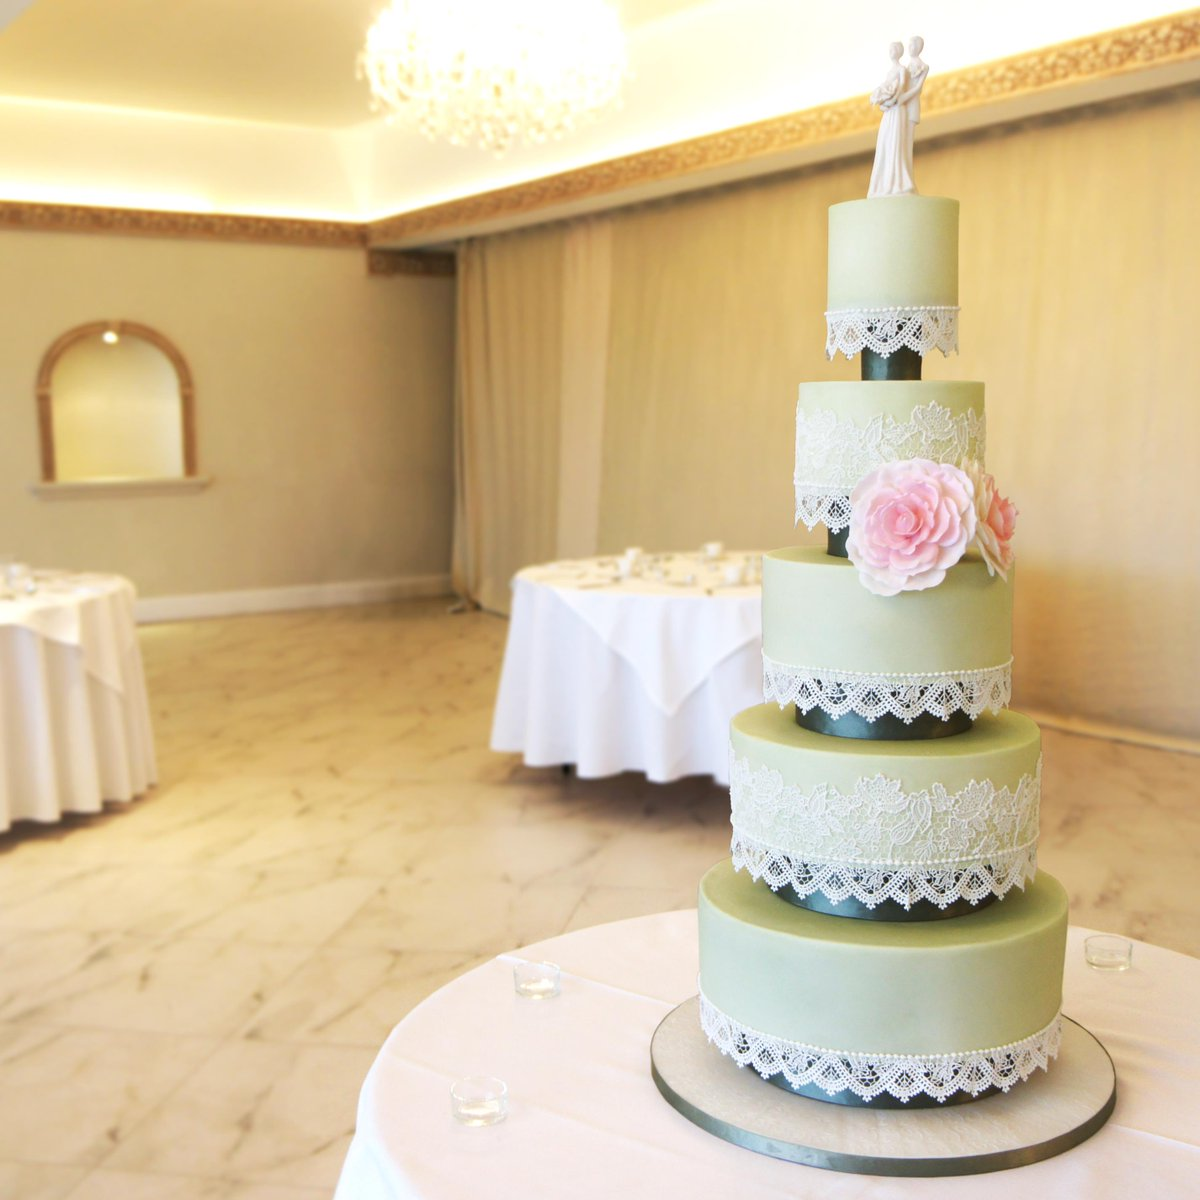 Cake & Lace Weddings (@CakeandLaceWedd) | Twitter